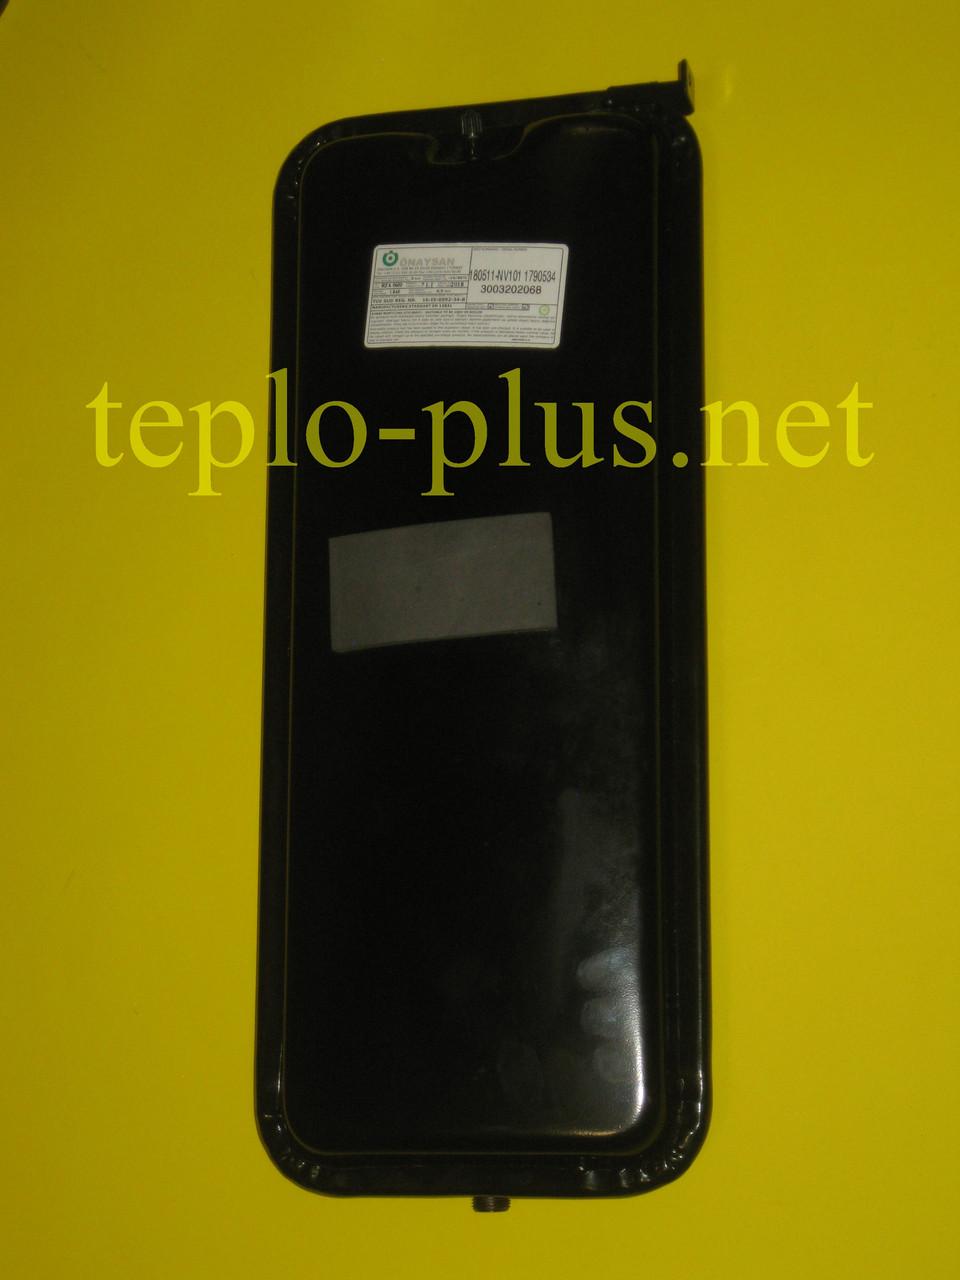 Расширительный бак 0020131391 (D003202068) Demrad Atron H24, H28, Nepto HKT 2-20, HKT 2-24, Nitromix P24, P28